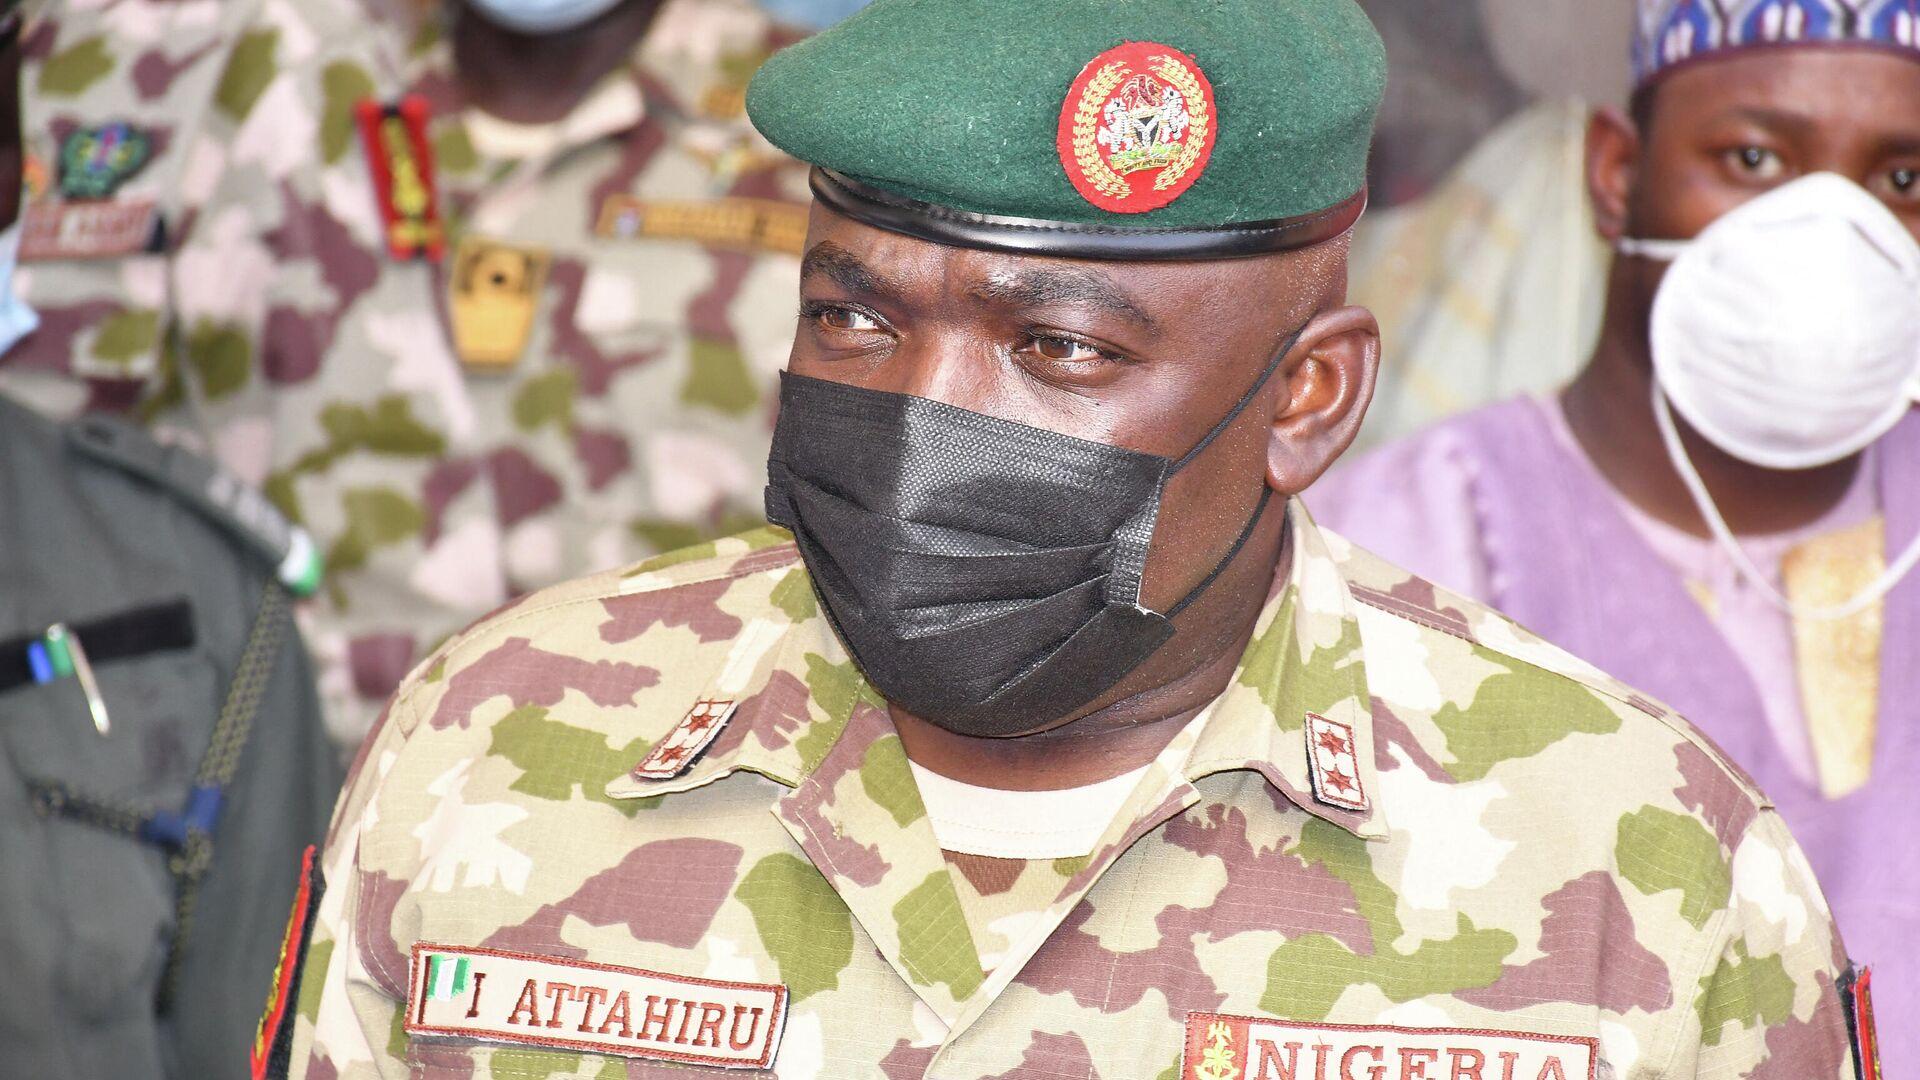 Ibrahim Attahiru, general del ejército de Nigeria - Sputnik Mundo, 1920, 21.05.2021